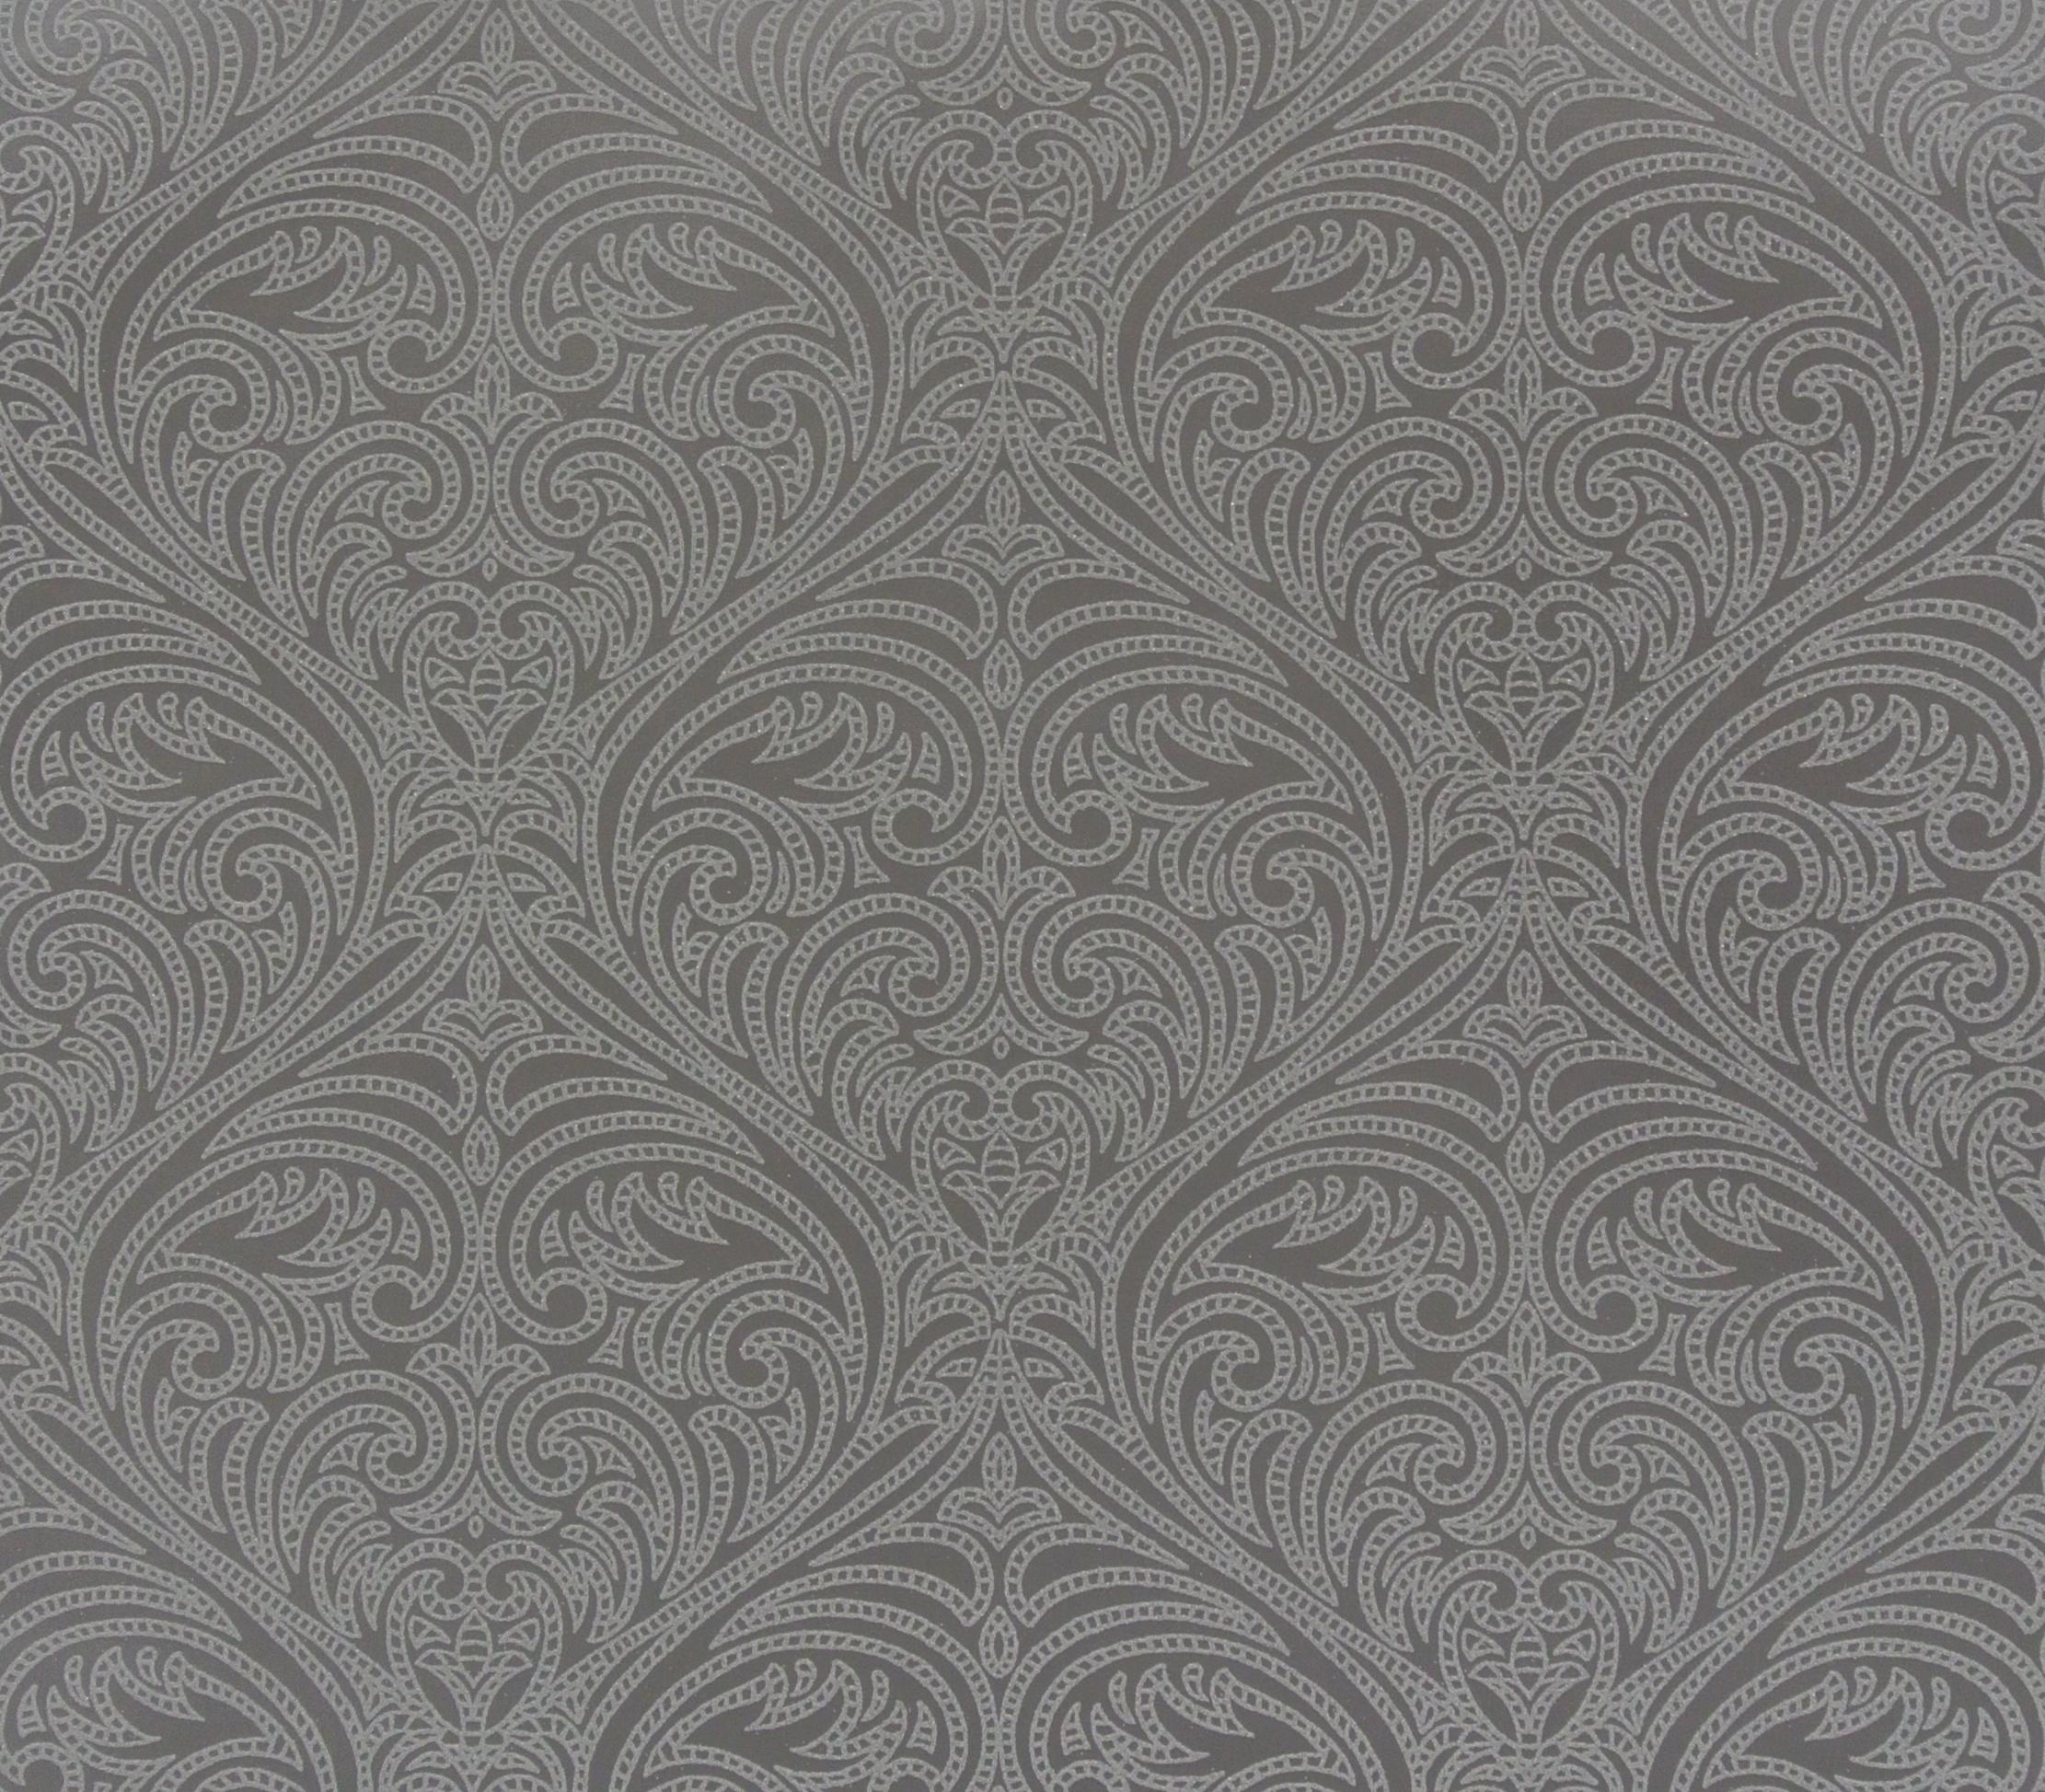 Https D3d71ba2asa5oz Cloudfront Net 12024463 Images Ol2775 Jpg Damask Wallpaper York Wallpaper Grey Damask Wallpaper